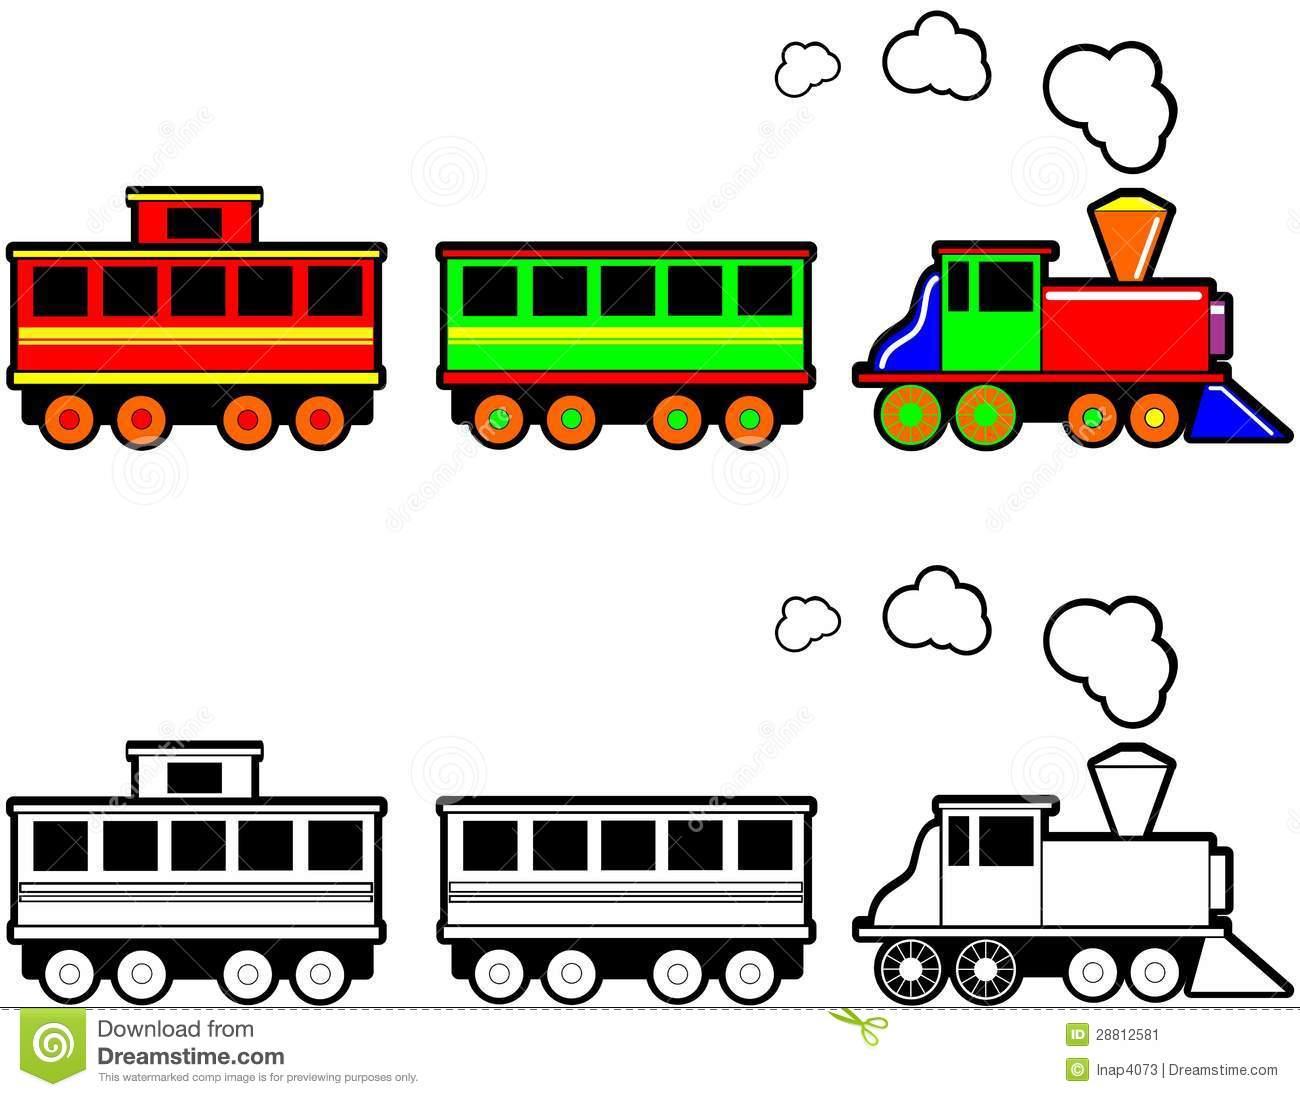 cartoon train clipart at getdrawings com free for personal use rh getdrawings com free train clipart printable free train clipart printables